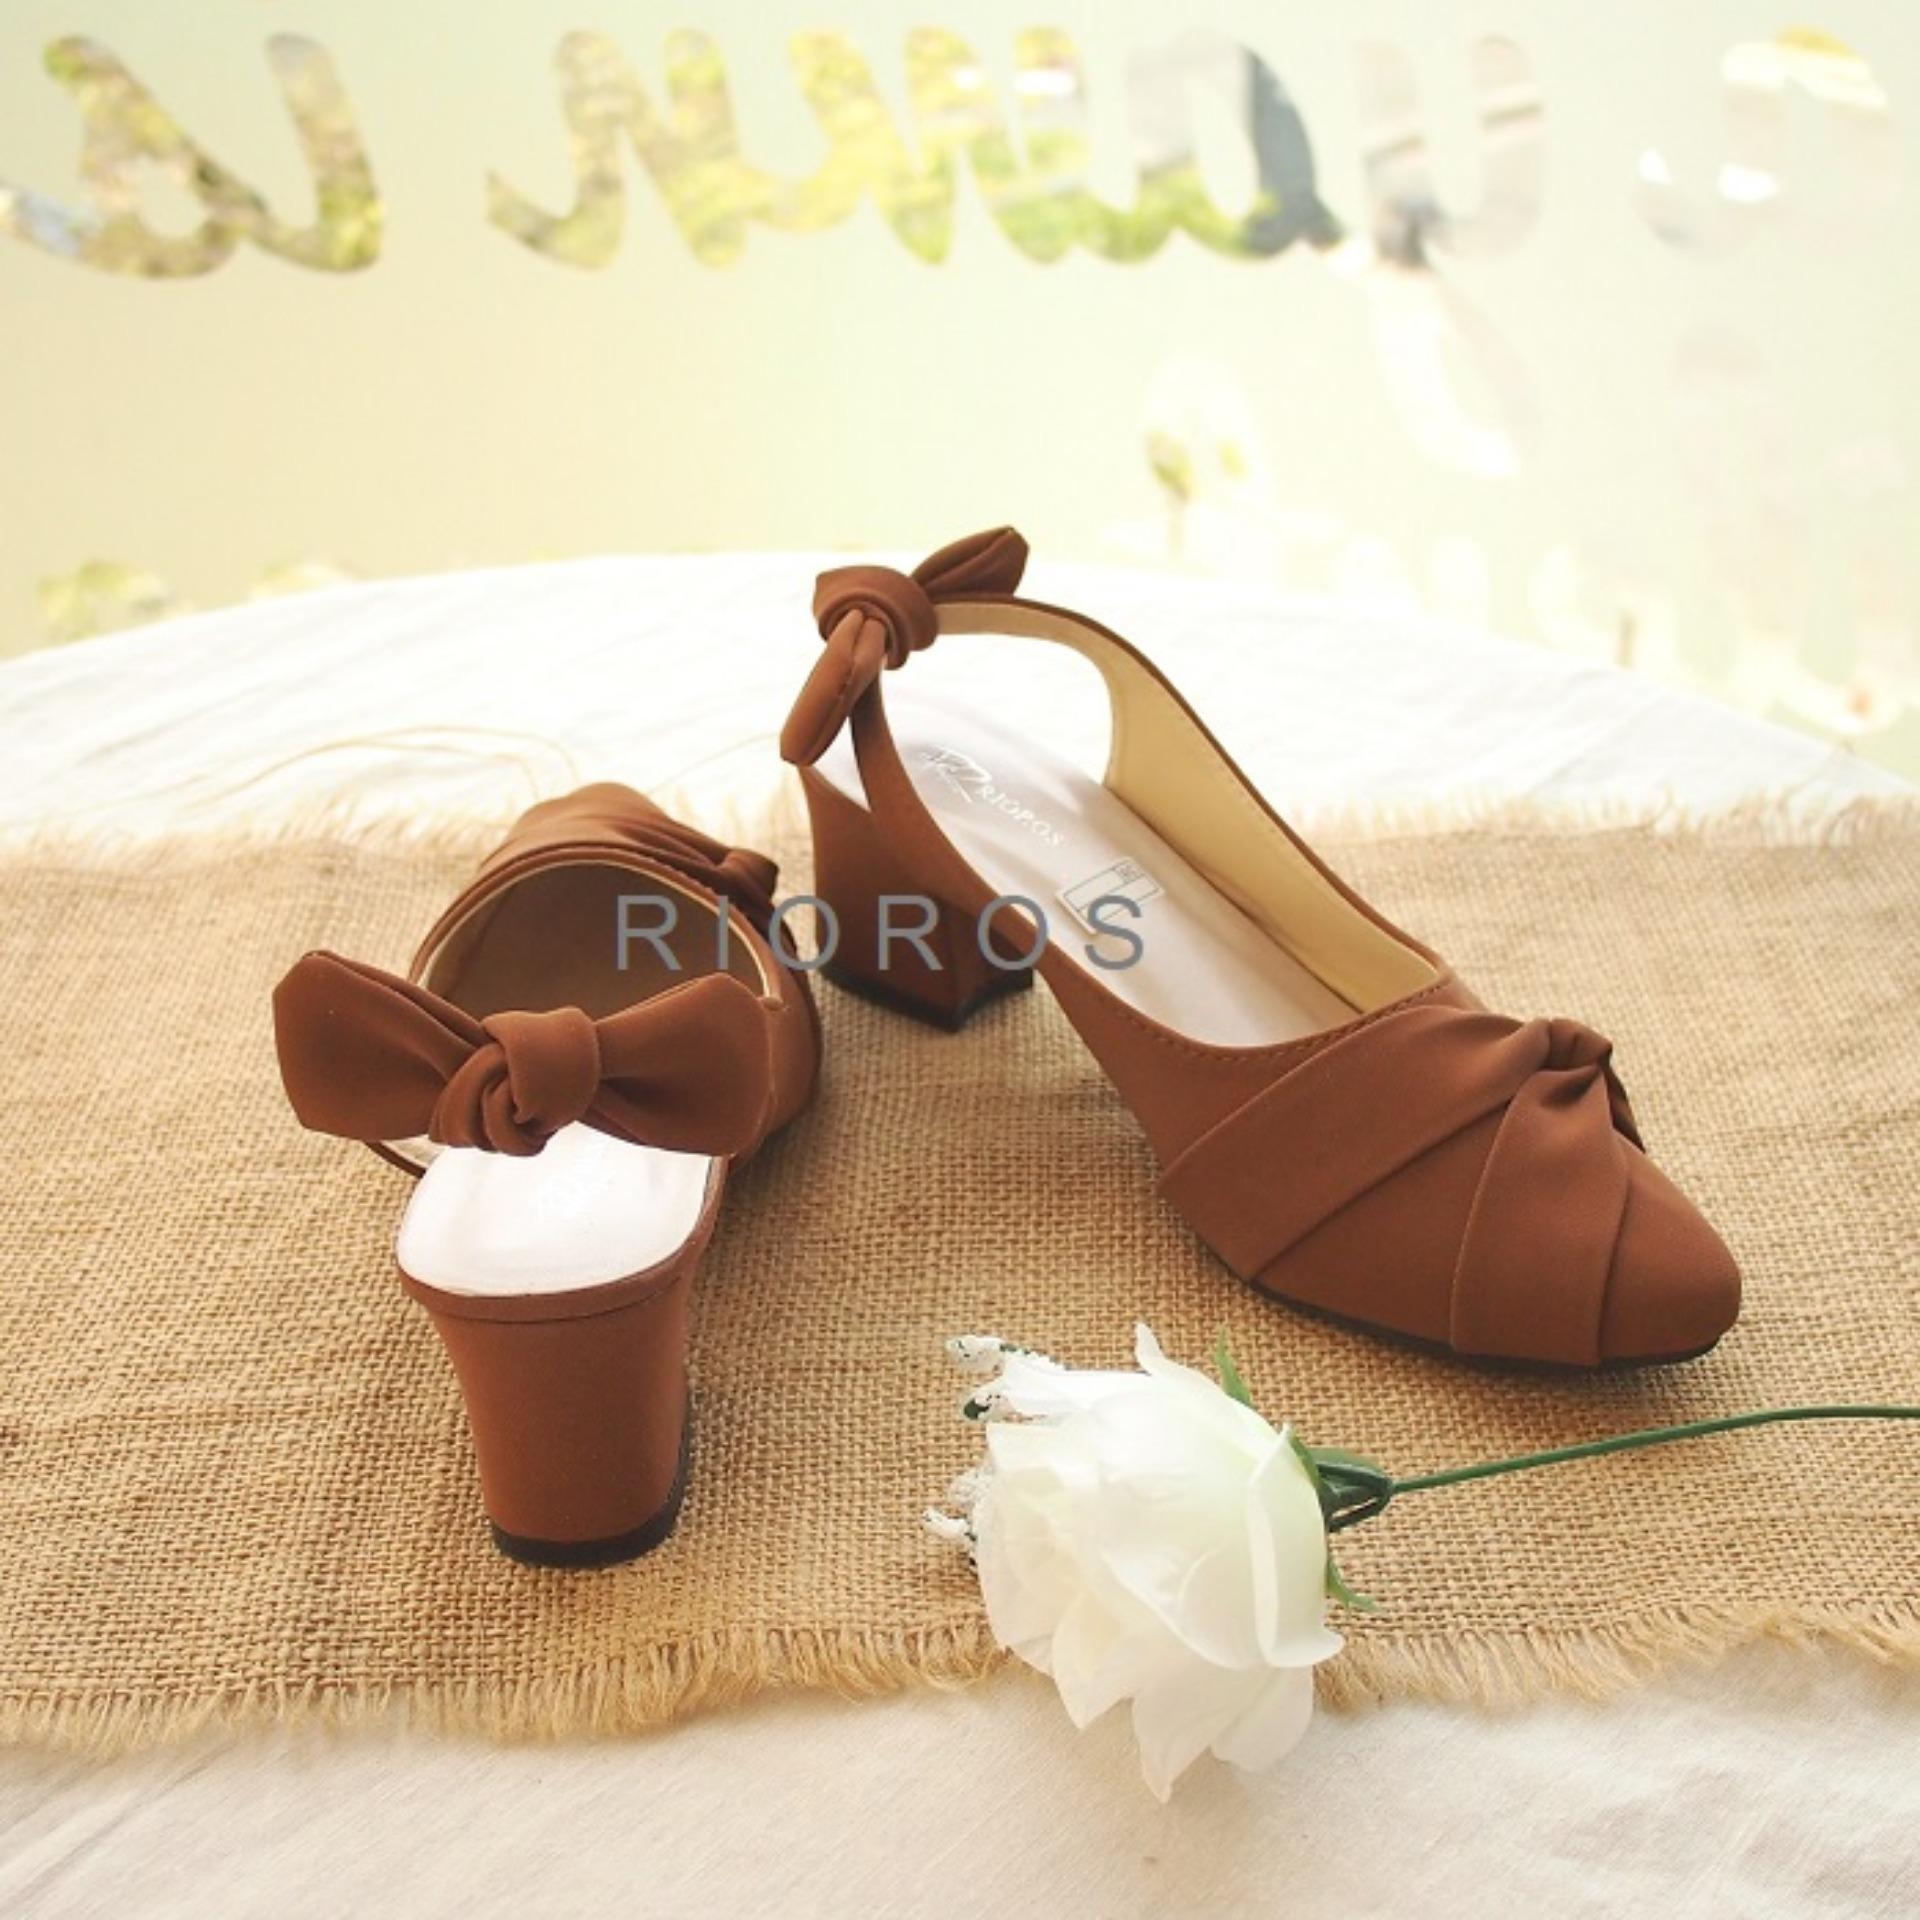 Rioros - Sepatu Wanita Hak Tahu Suade Pita Belakang Ilena - Tan